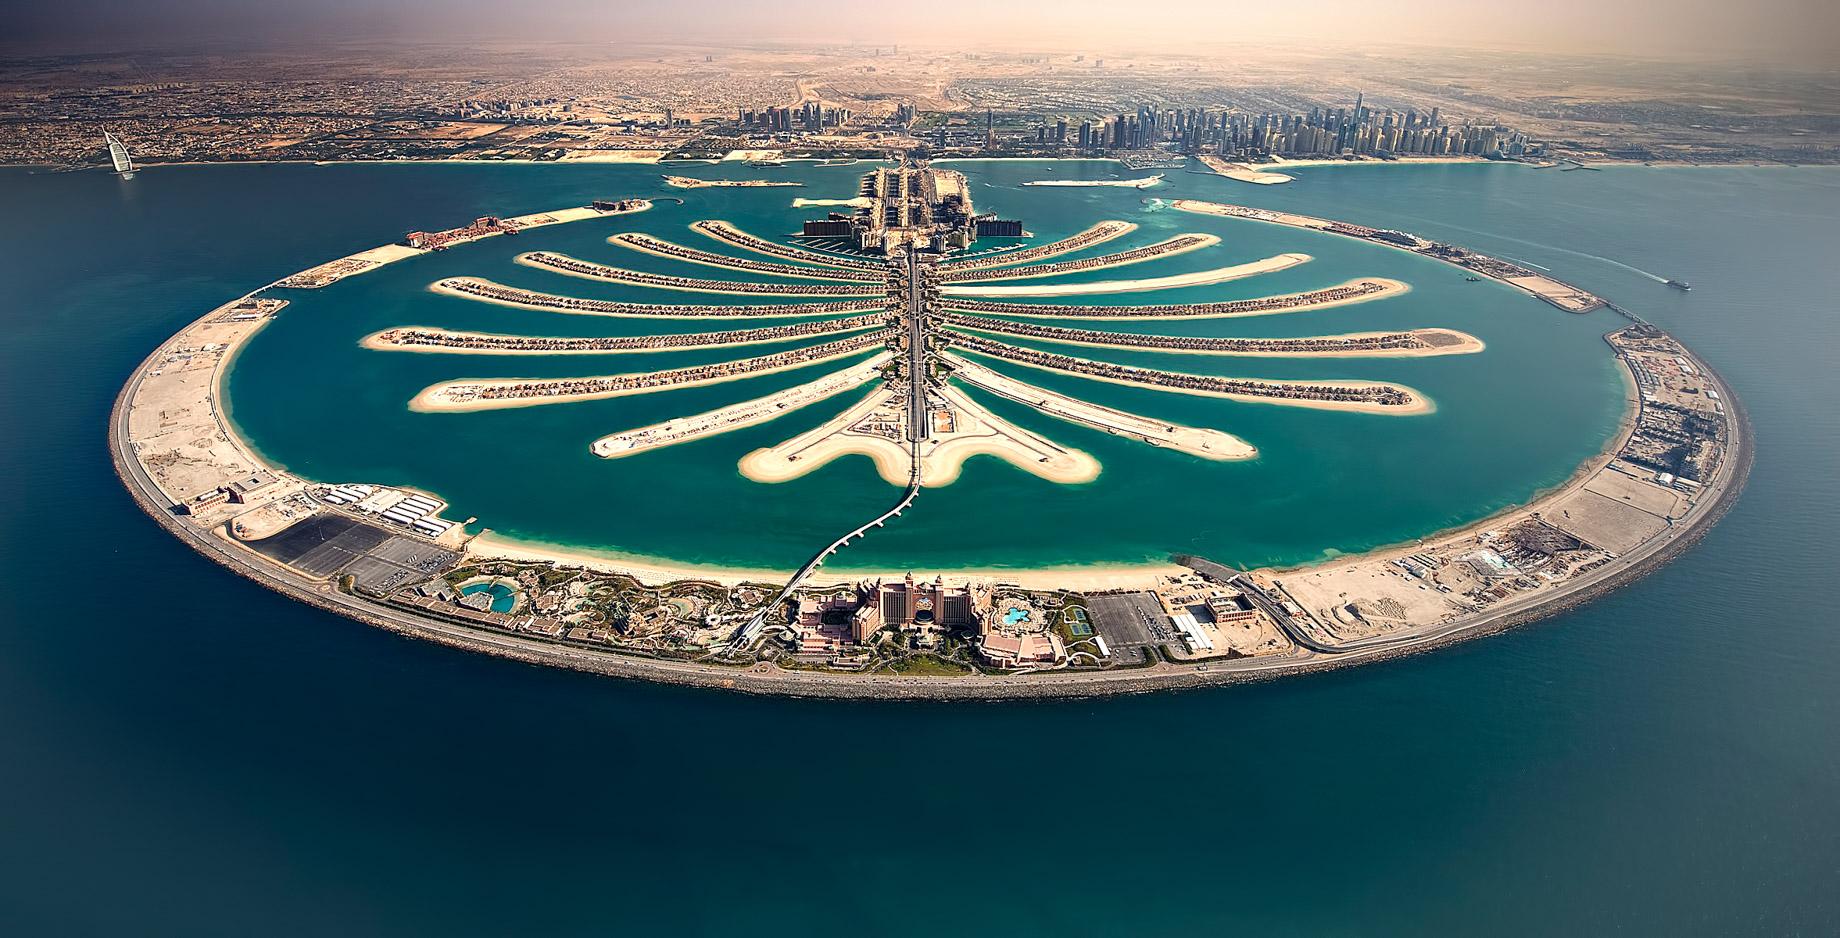 Palm Jumeirah Island - Dubai, United Arab Emirates